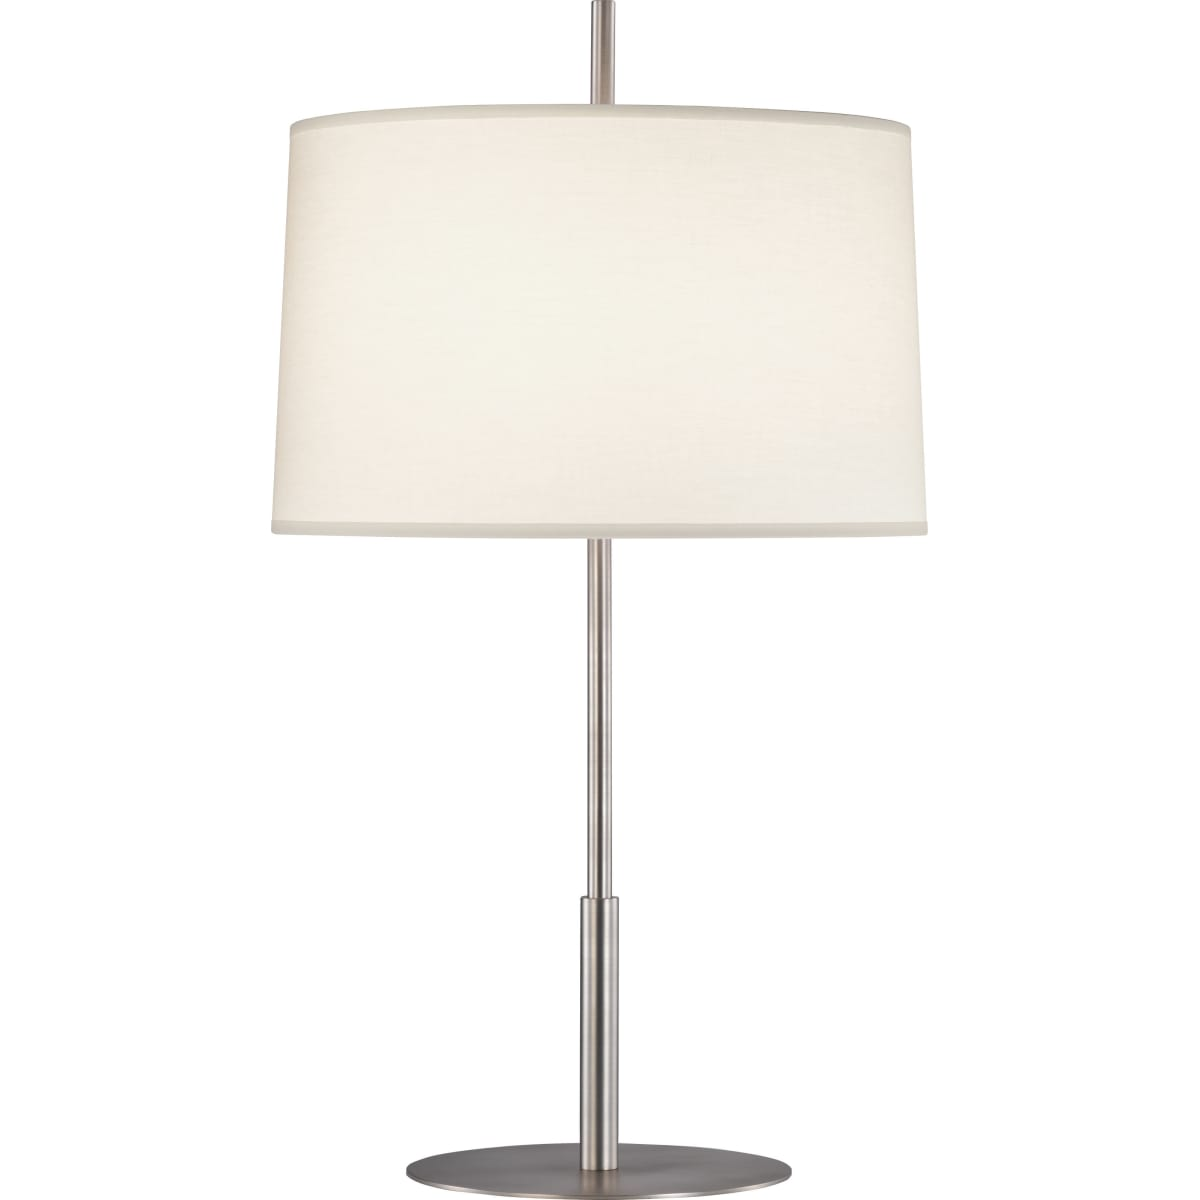 Robert Abbey S2180 Stainless Echo 30 Buffet Table Lamp Lightingshowplace Com